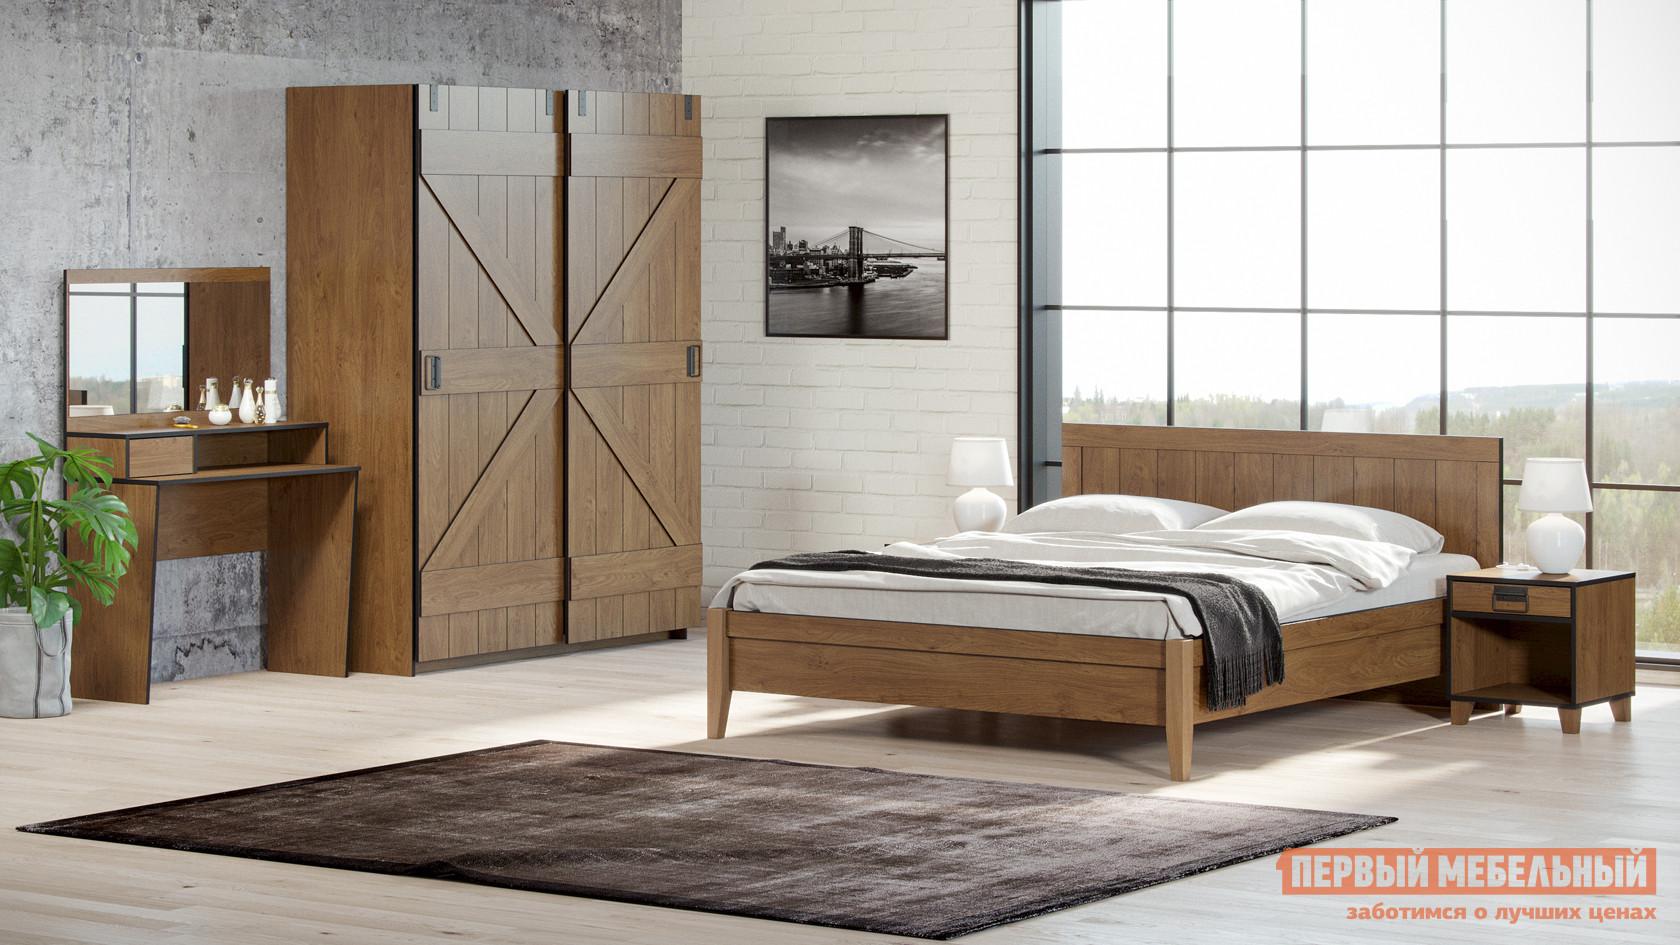 Спальный гарнитур WOODCRAFT Эссен КС шкаф распашной woodcraft эссен шкаф 1 дверь